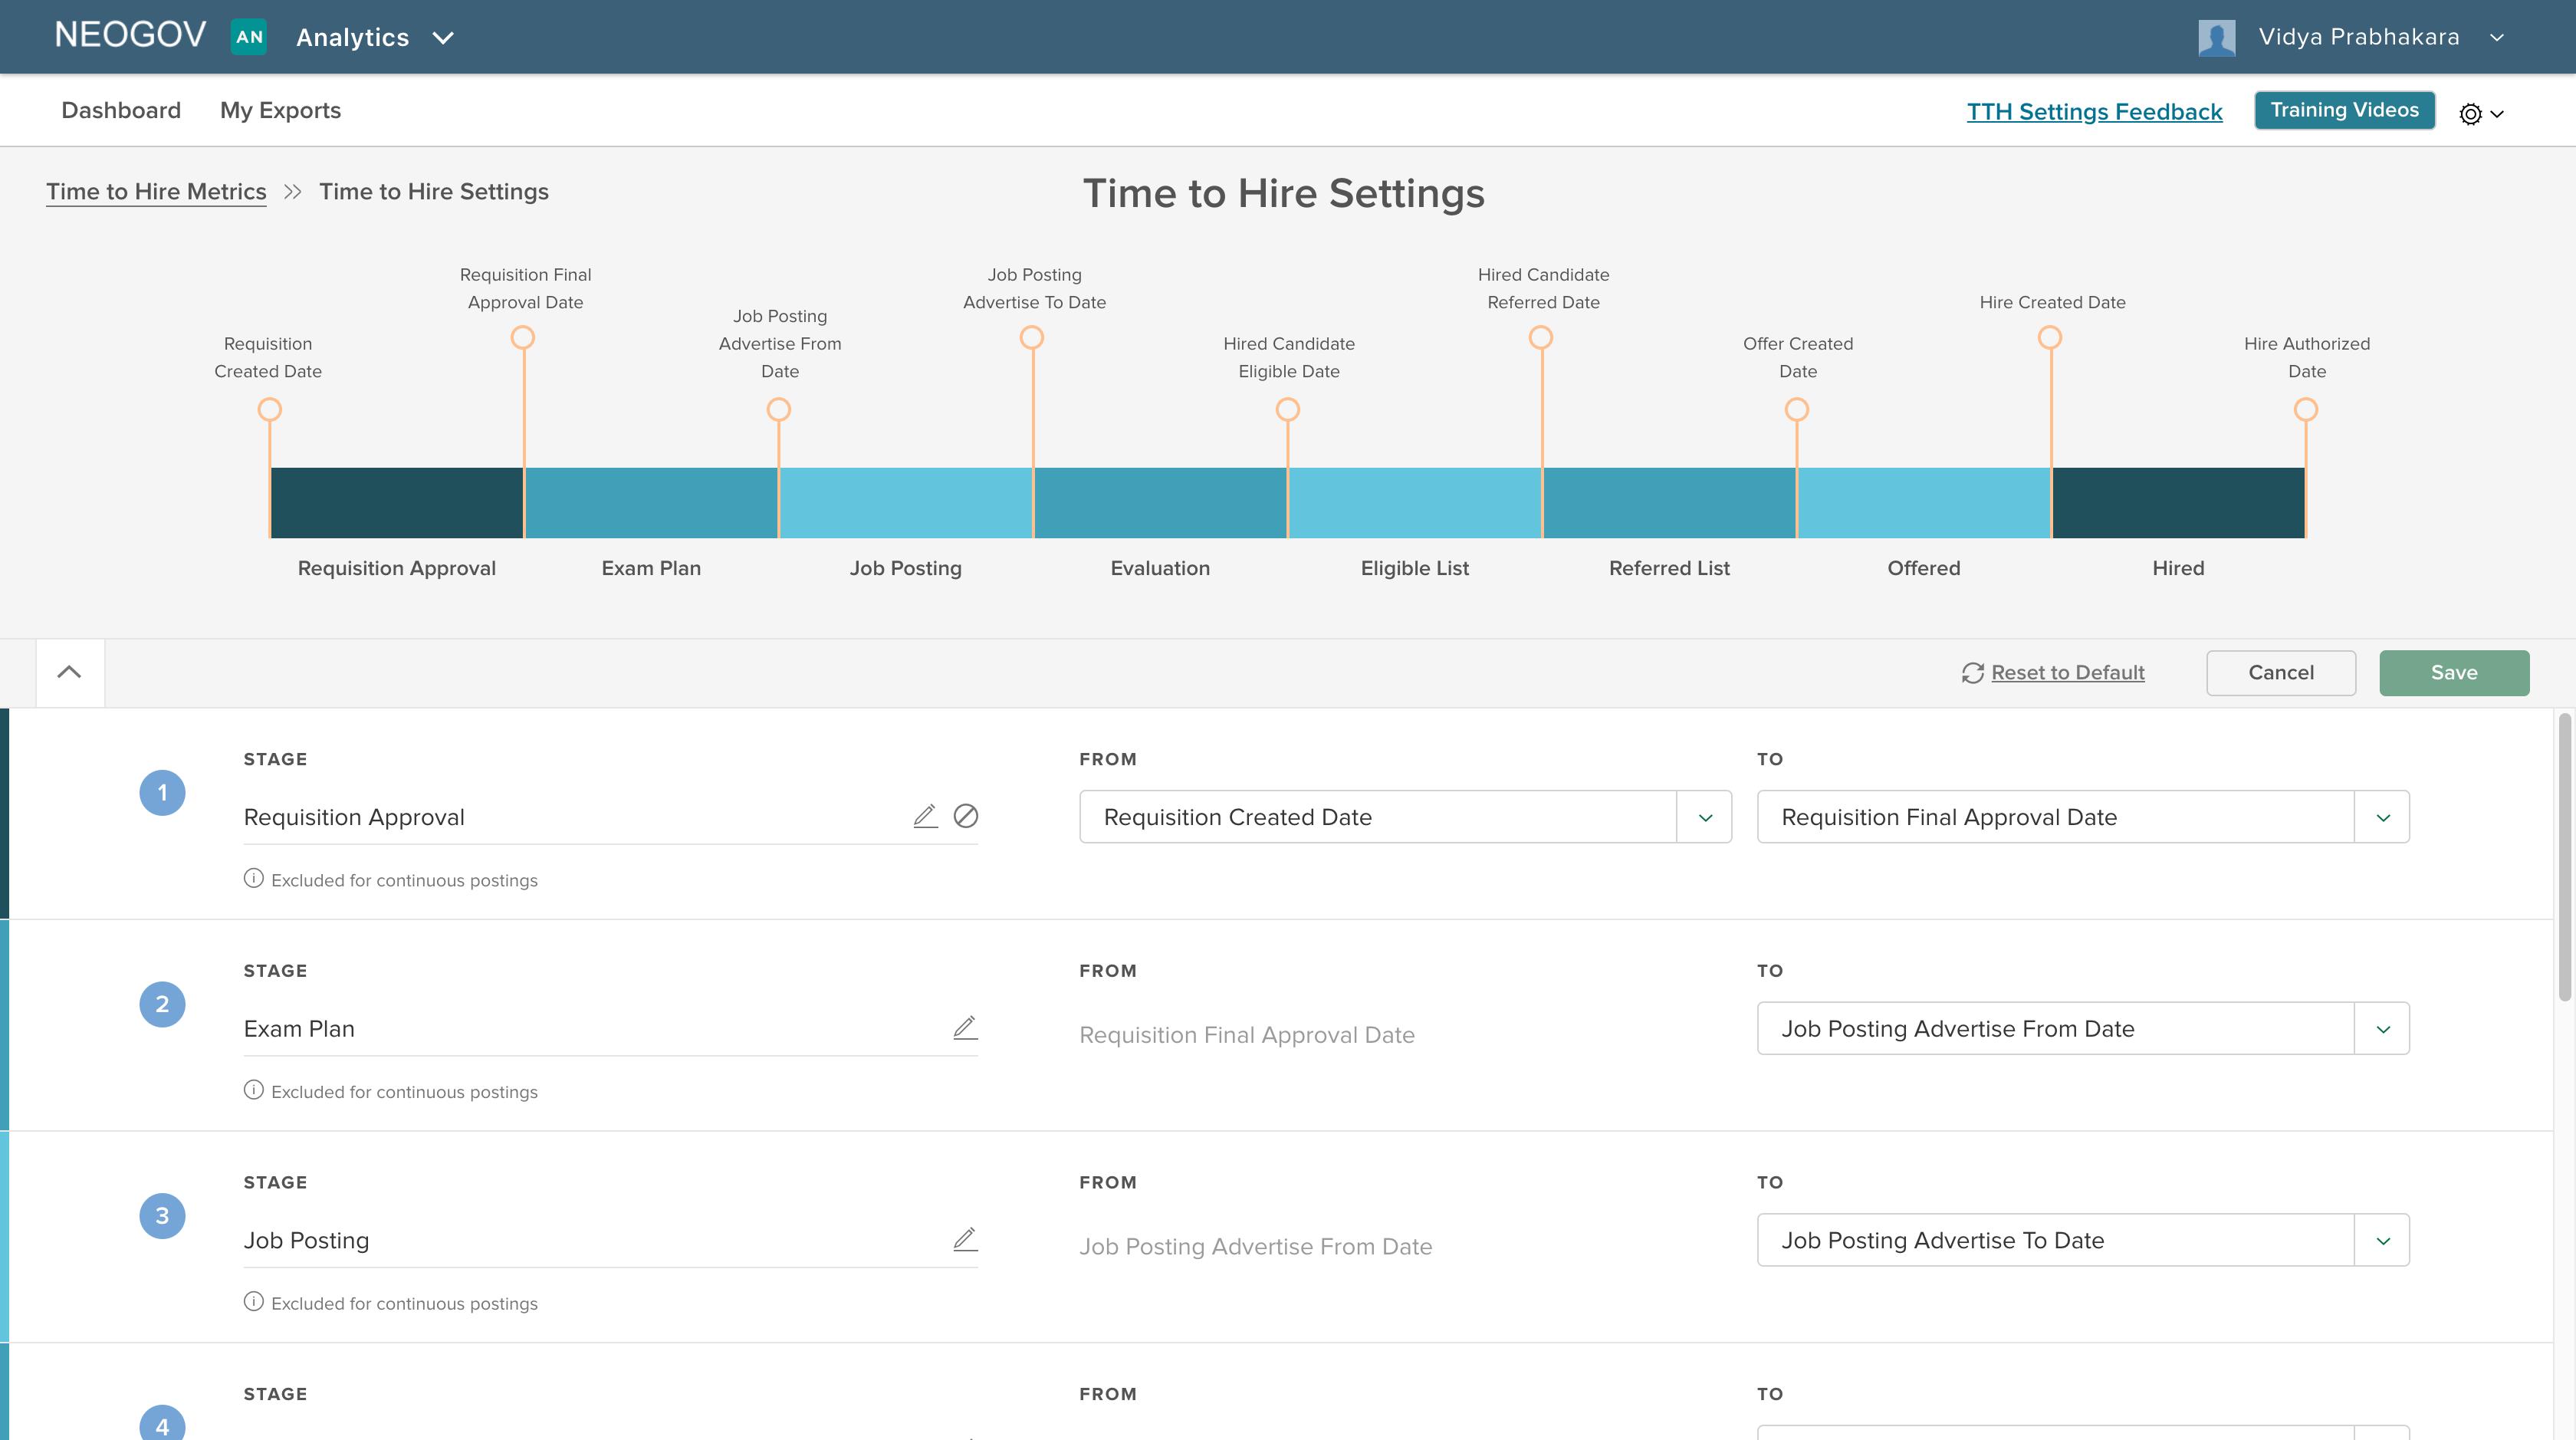 screenshot-analytics-demo.uat.neogov.net-2020.06.09-17_25_16